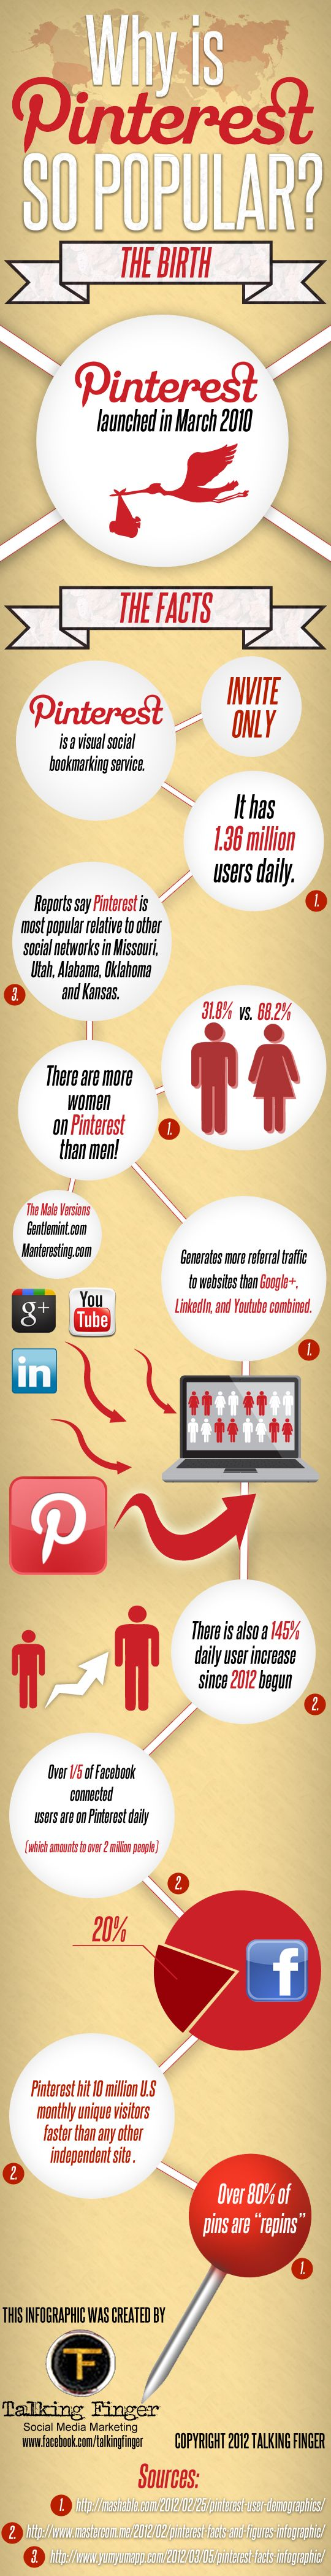 Why is Pinterest so popular? (#Infographic) #SocialMedia